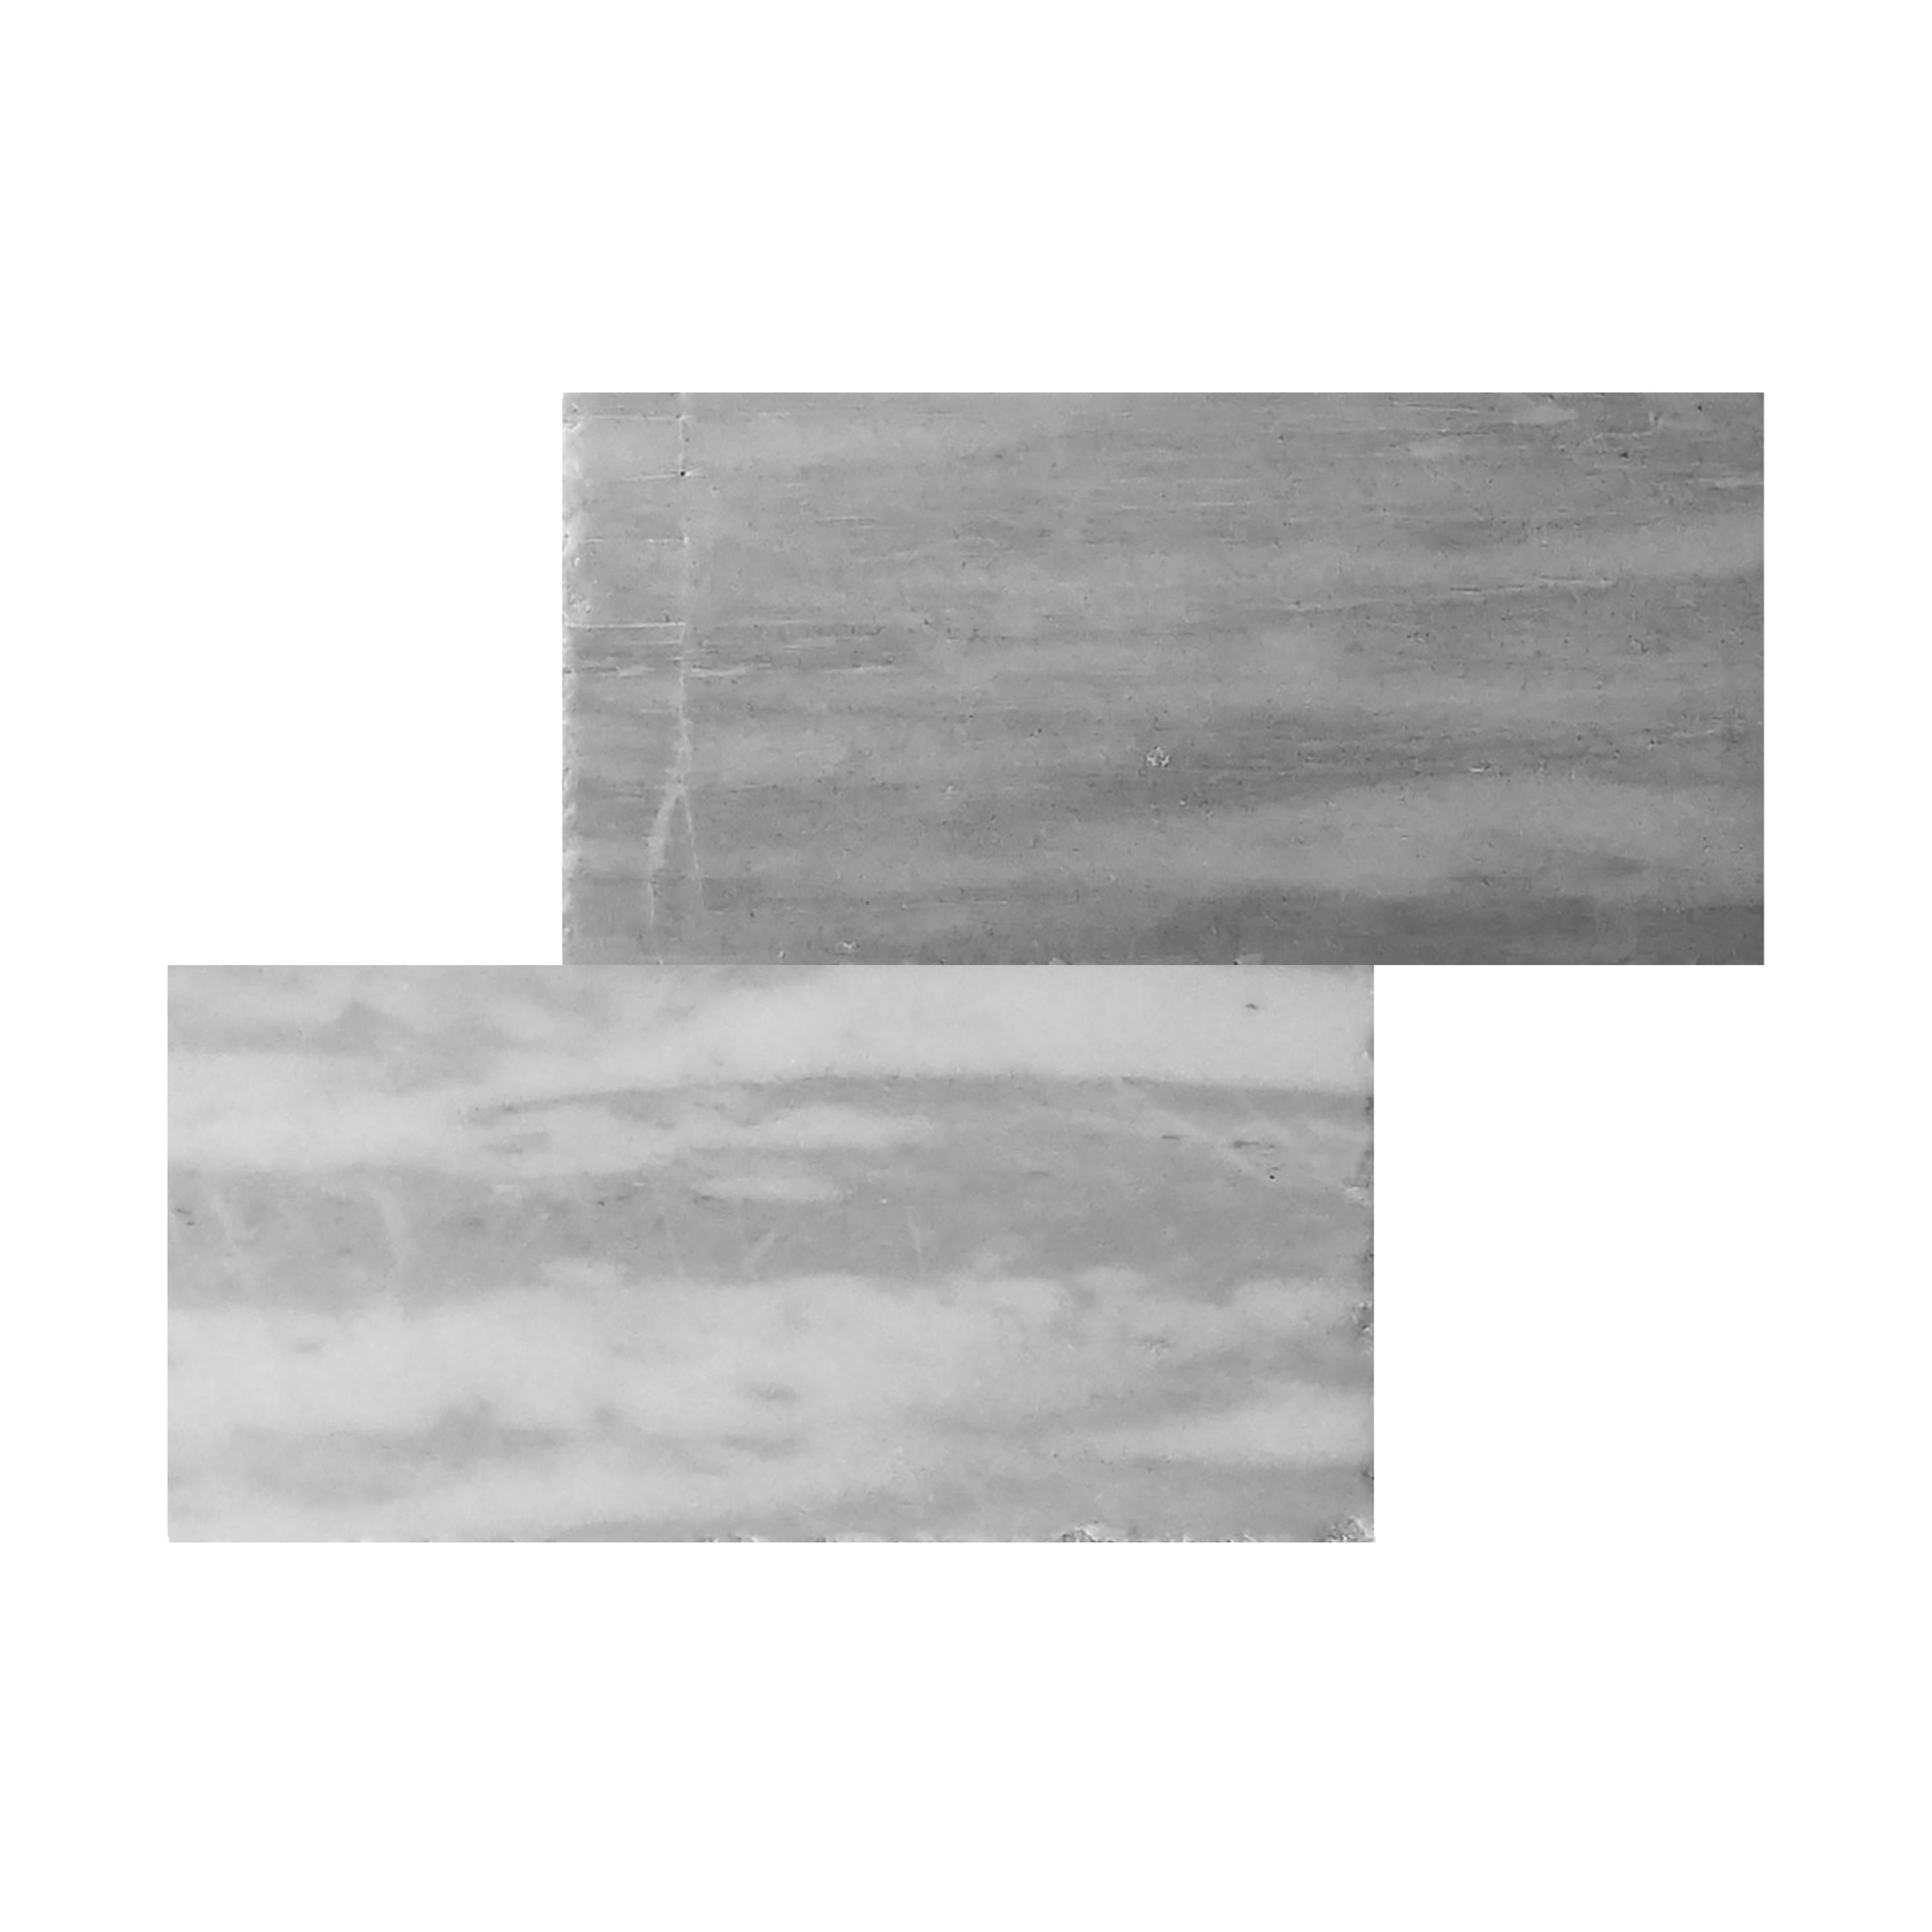 12x24 Marble Tile: 12x24 CARRARA GRAY Polished-BEVELED Marble Tile